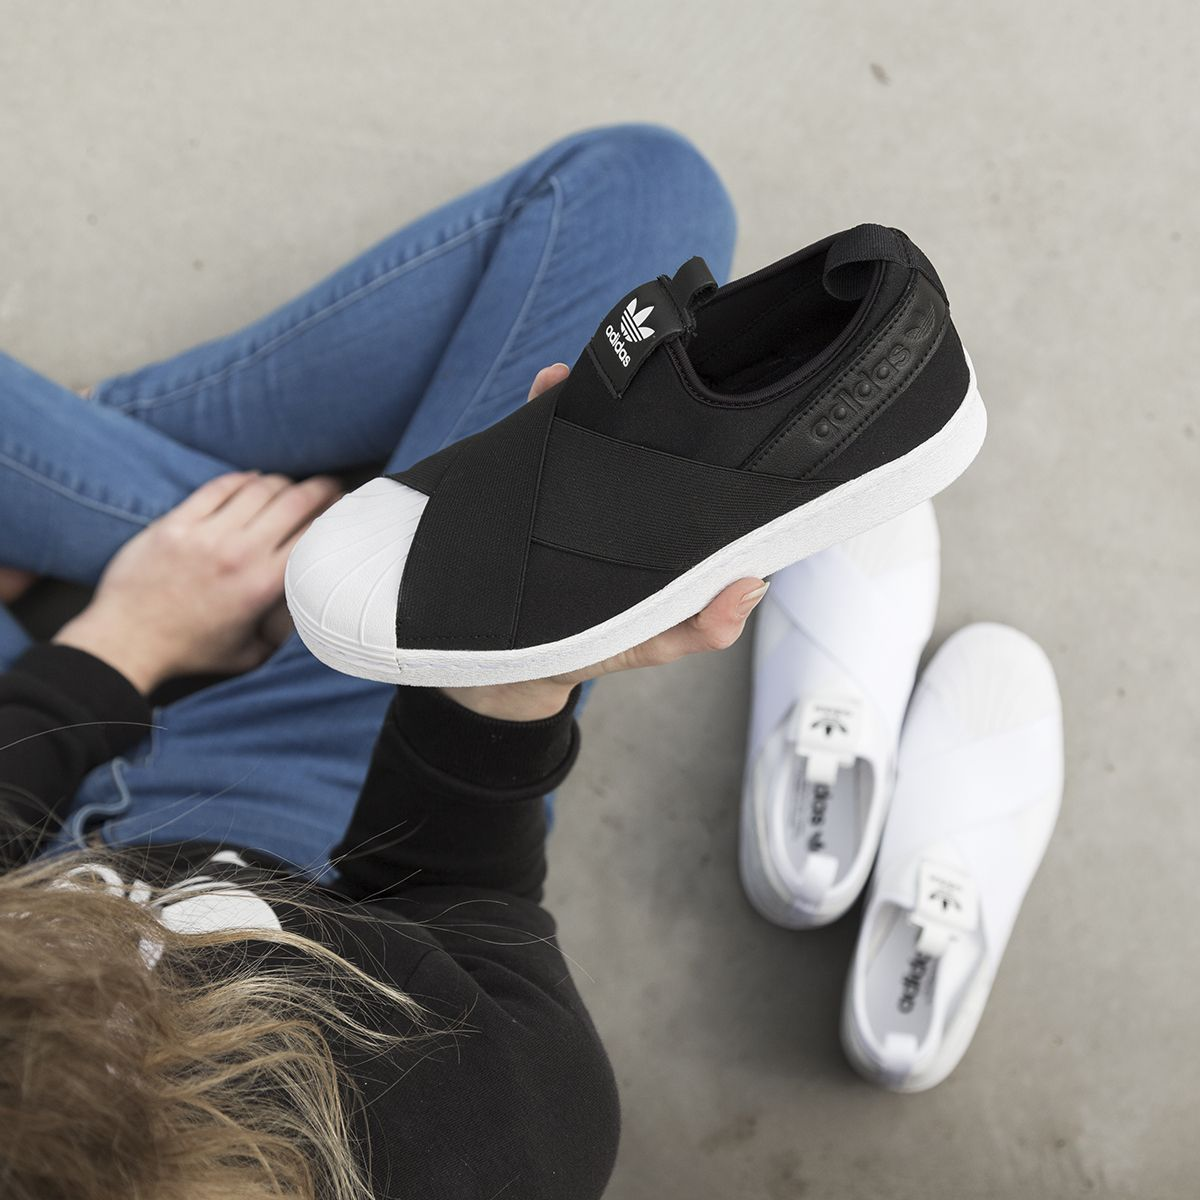 Slip-on sneaker style - adidas 'Superstar Slip On'. Shop: https